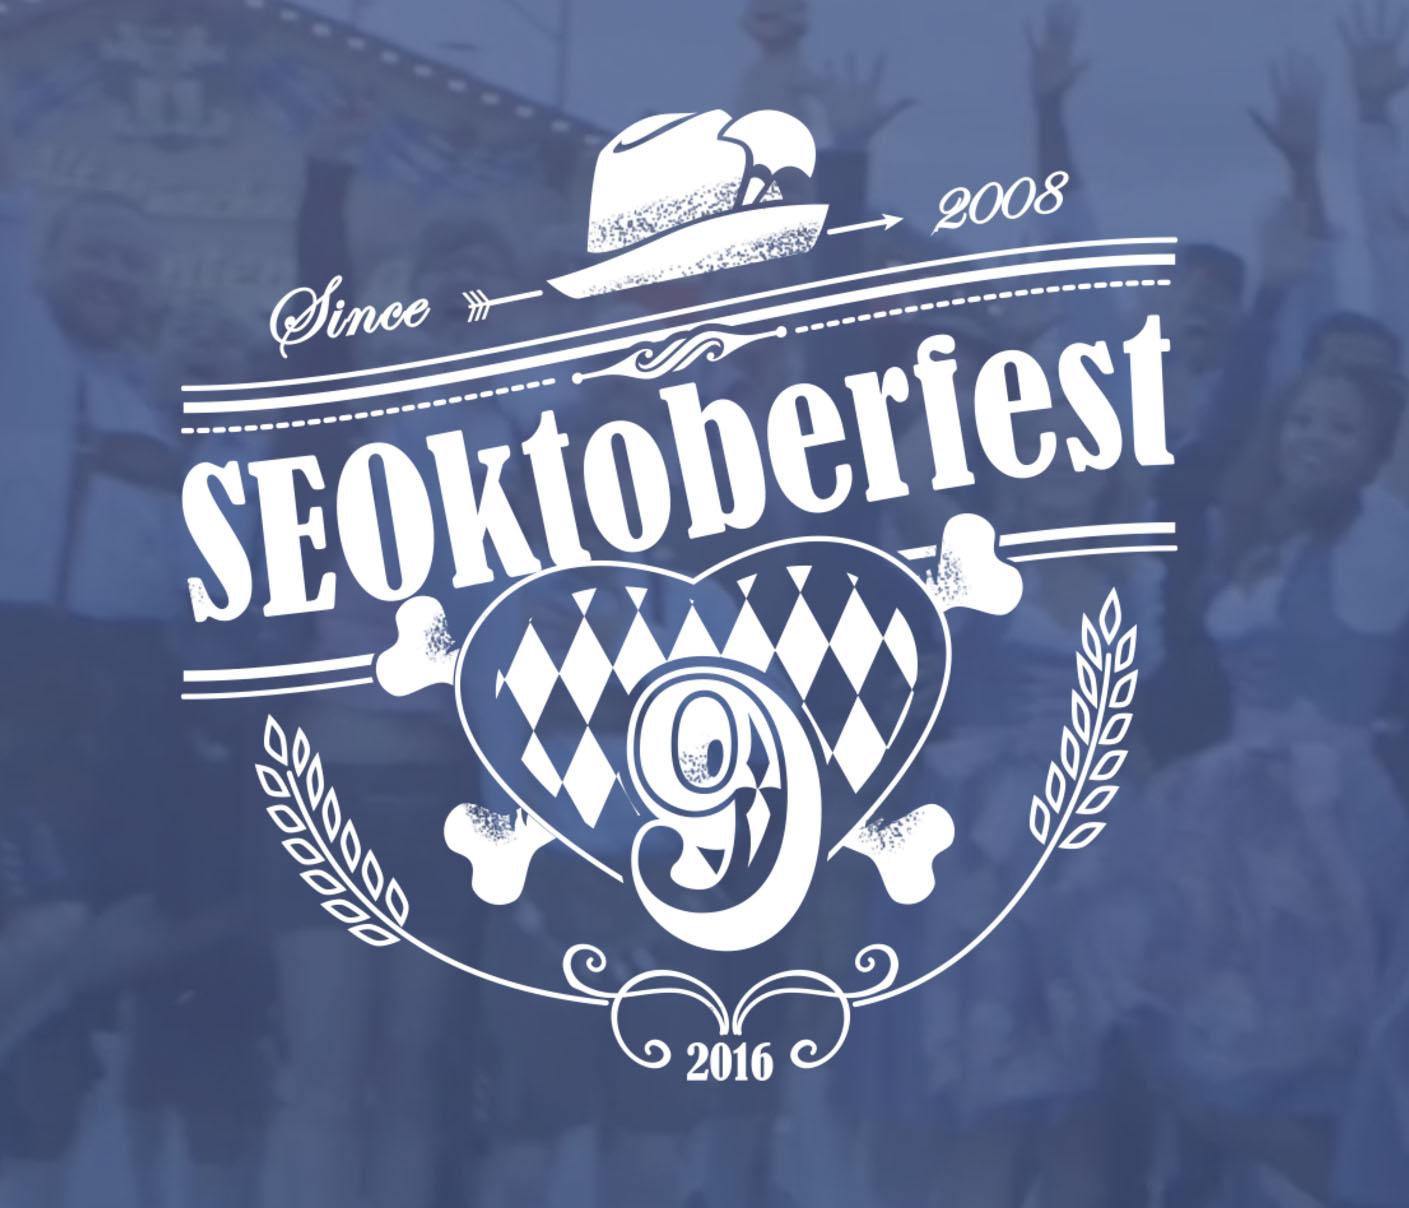 SEOktoberfest 9 Logo